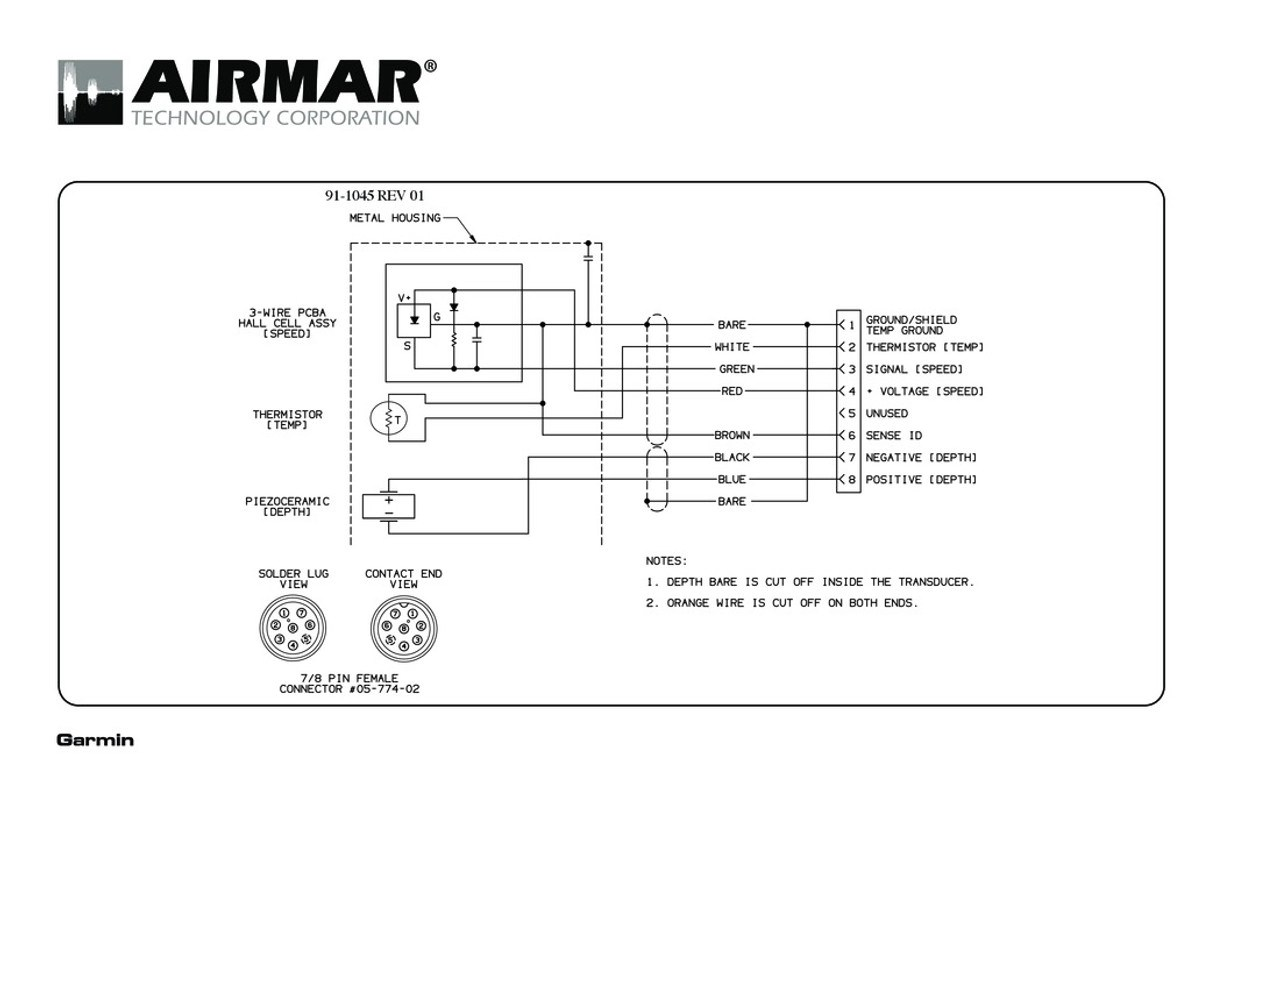 small resolution of airmar wiring diagram garmin b744 8 pin d s t blue bottle marine garmin marine wiring diagrams